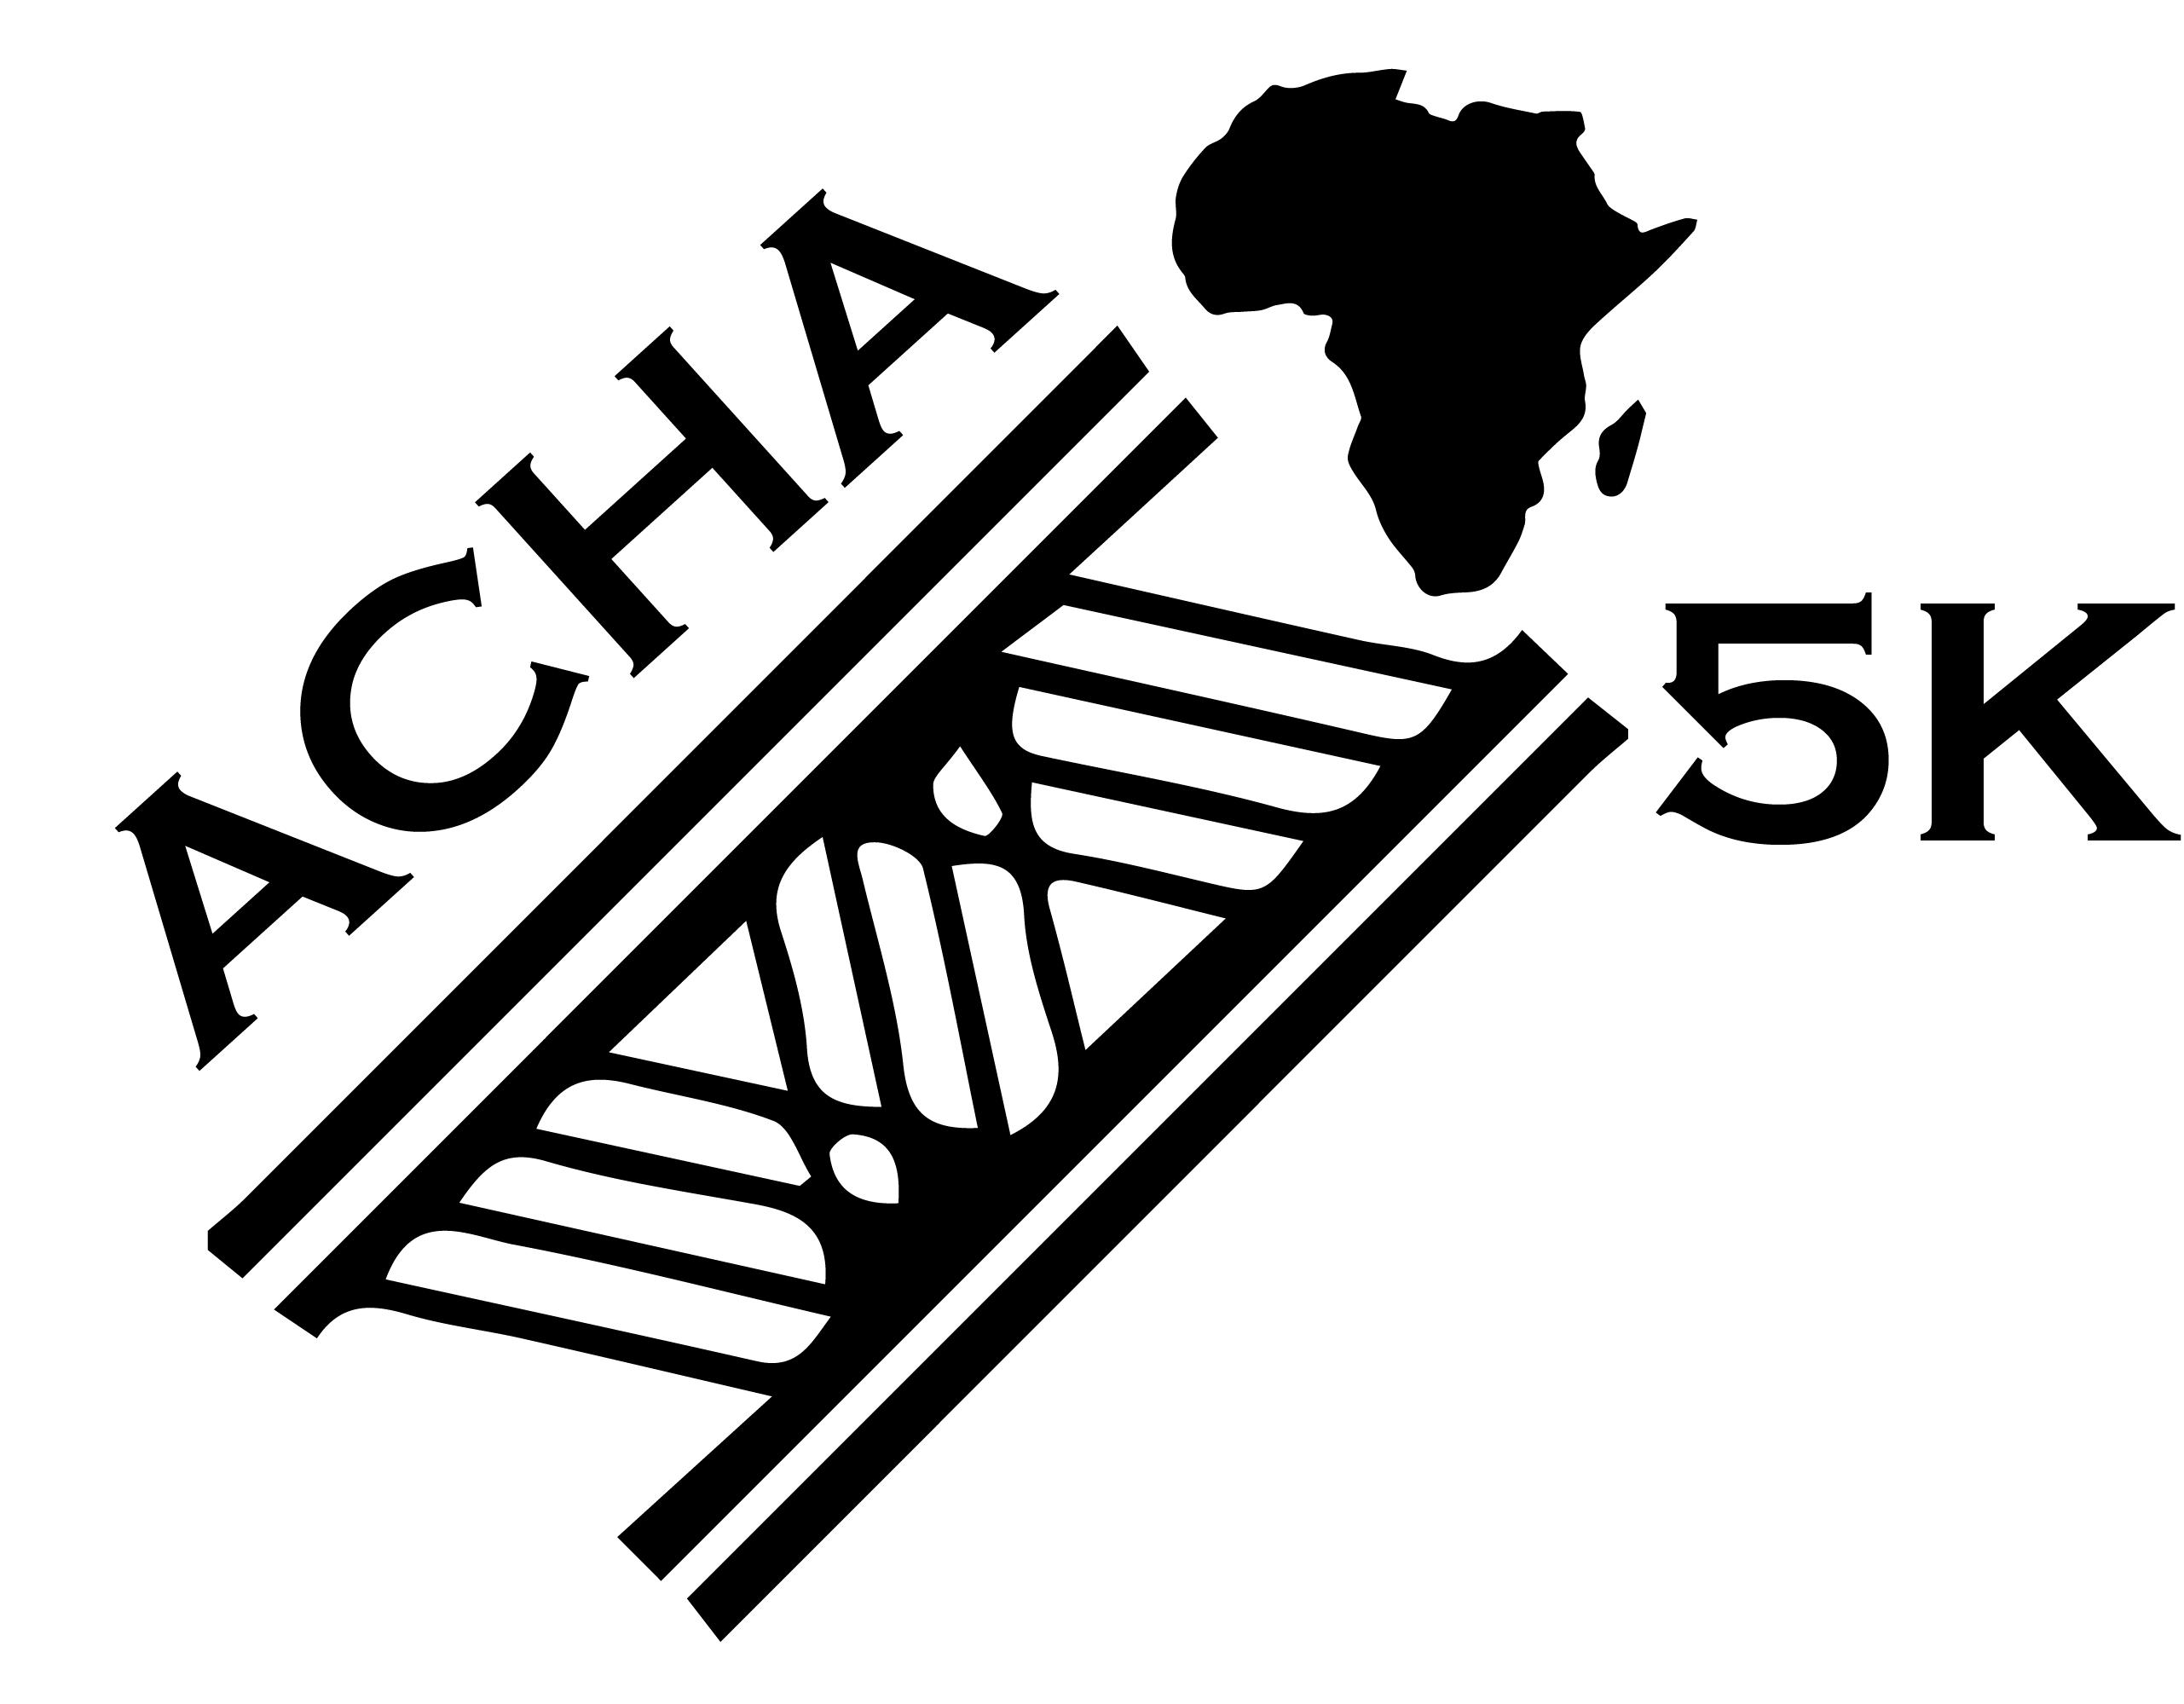 Acha5 Klogo2018